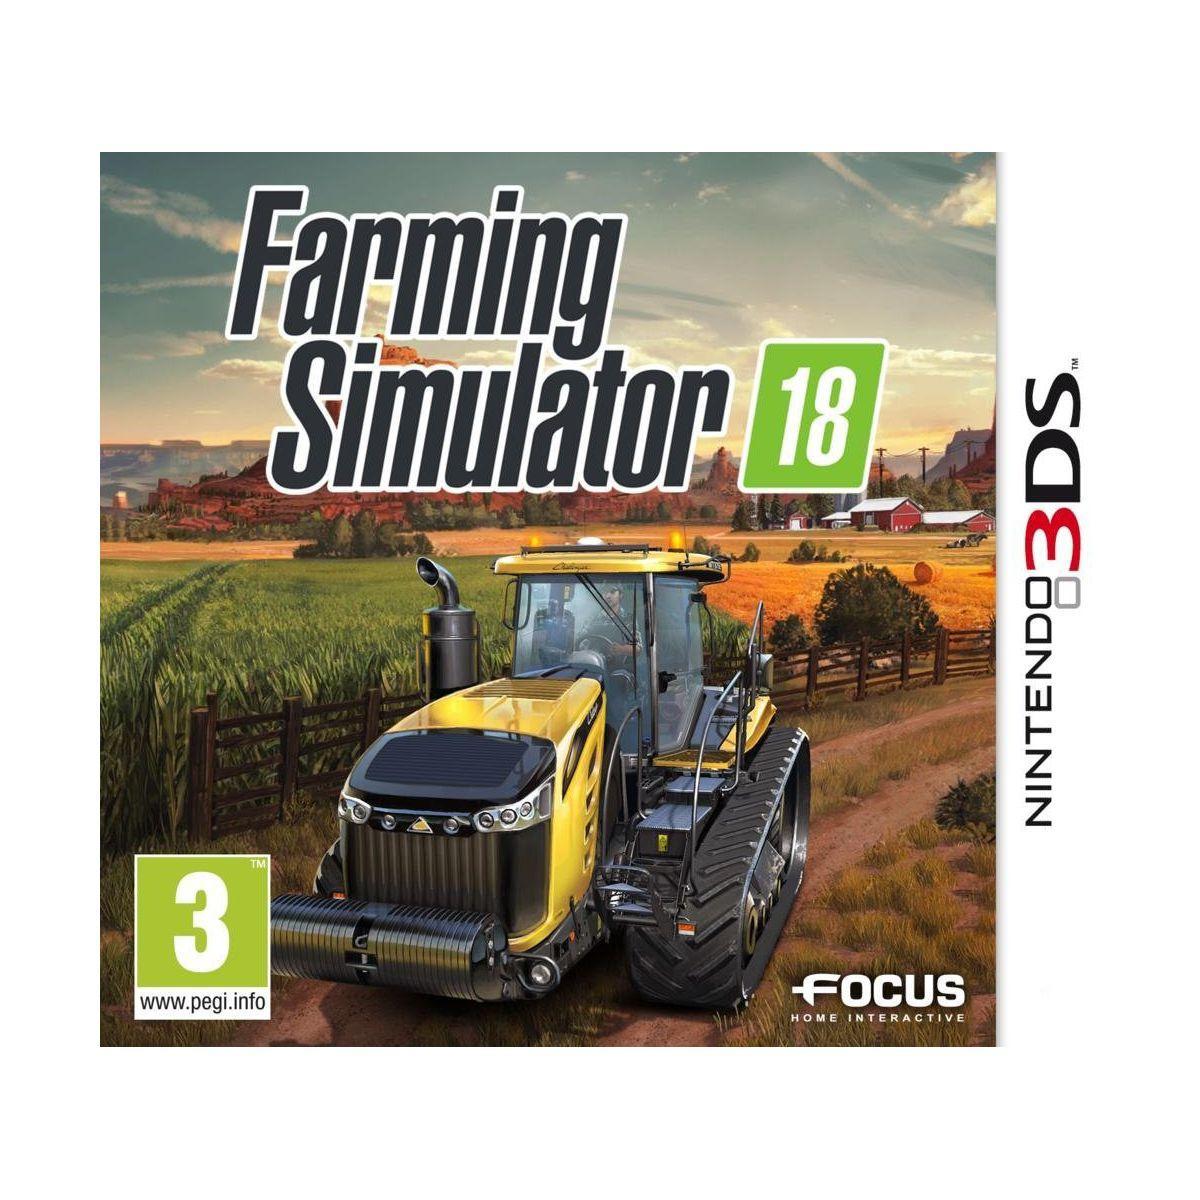 Jeu 3ds focus farming simulator 18 (photo)